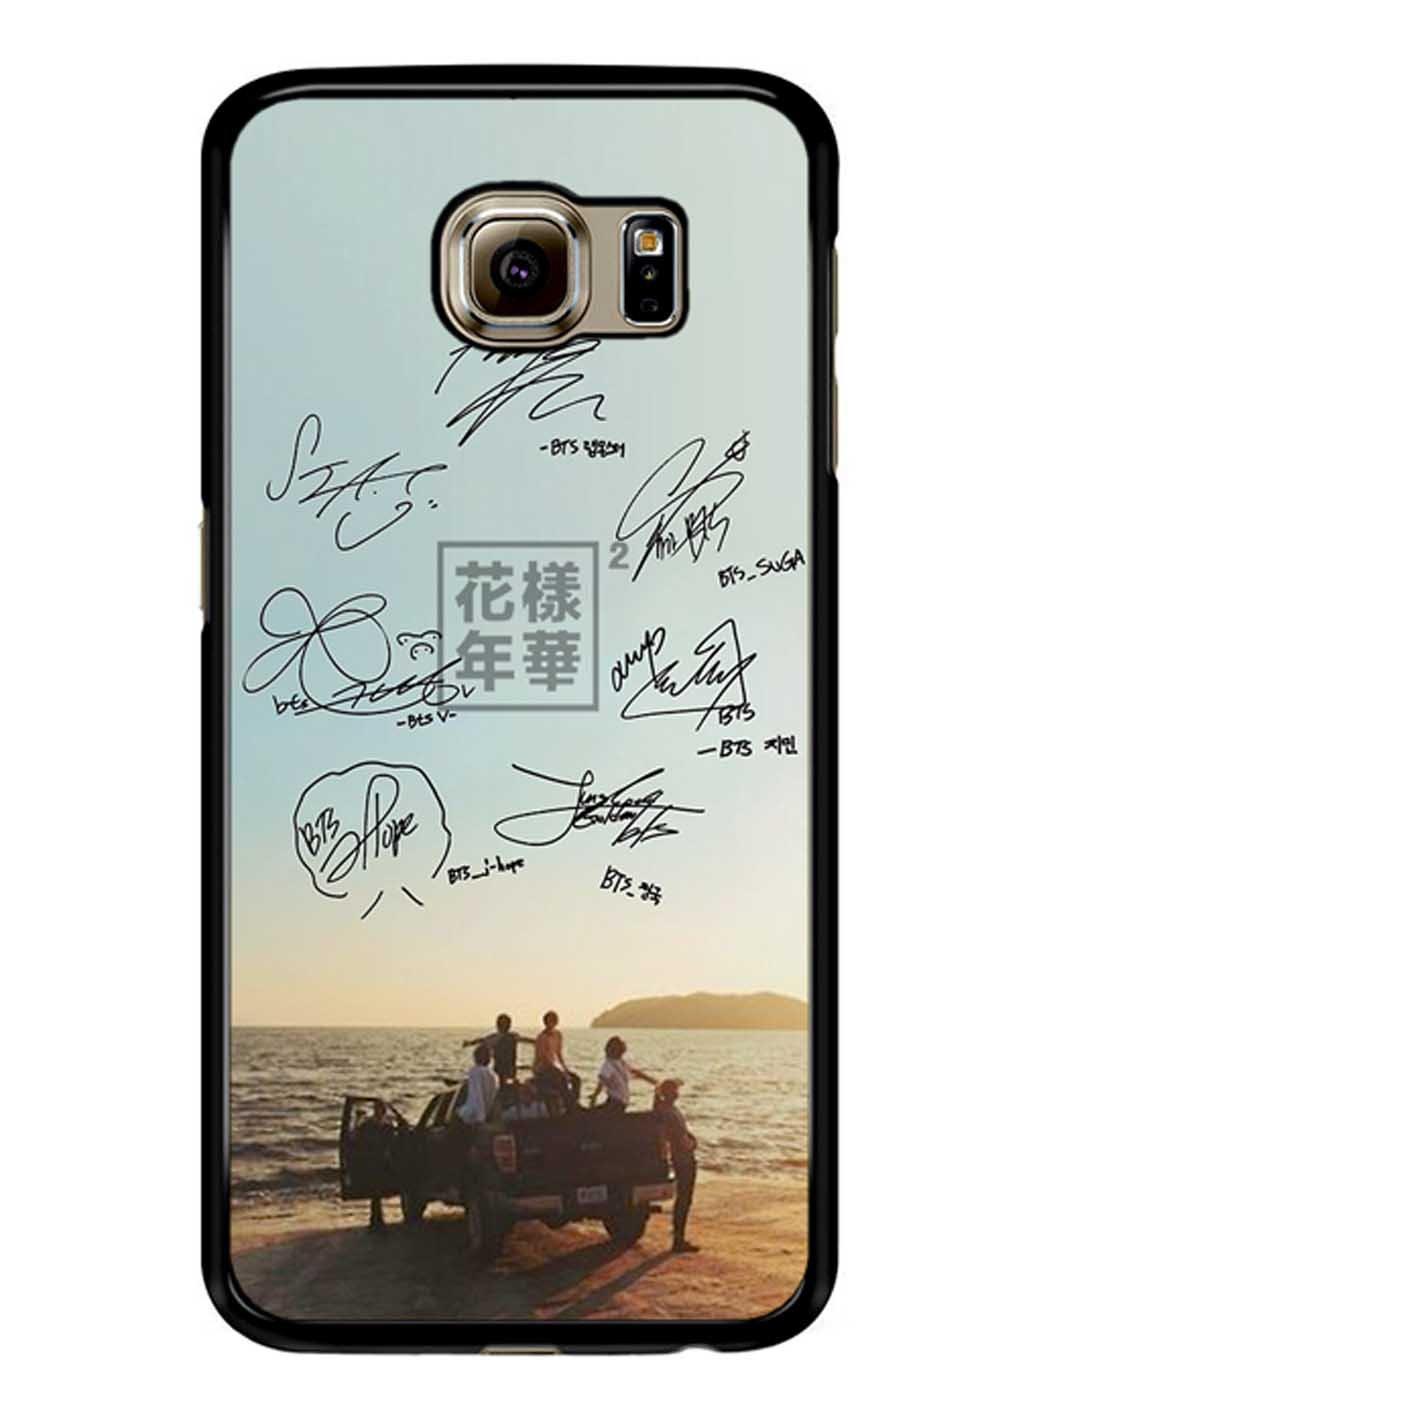 Bts Phone Signature 2 Case Samsung Galaxy S7 Amazon Co Uk Books